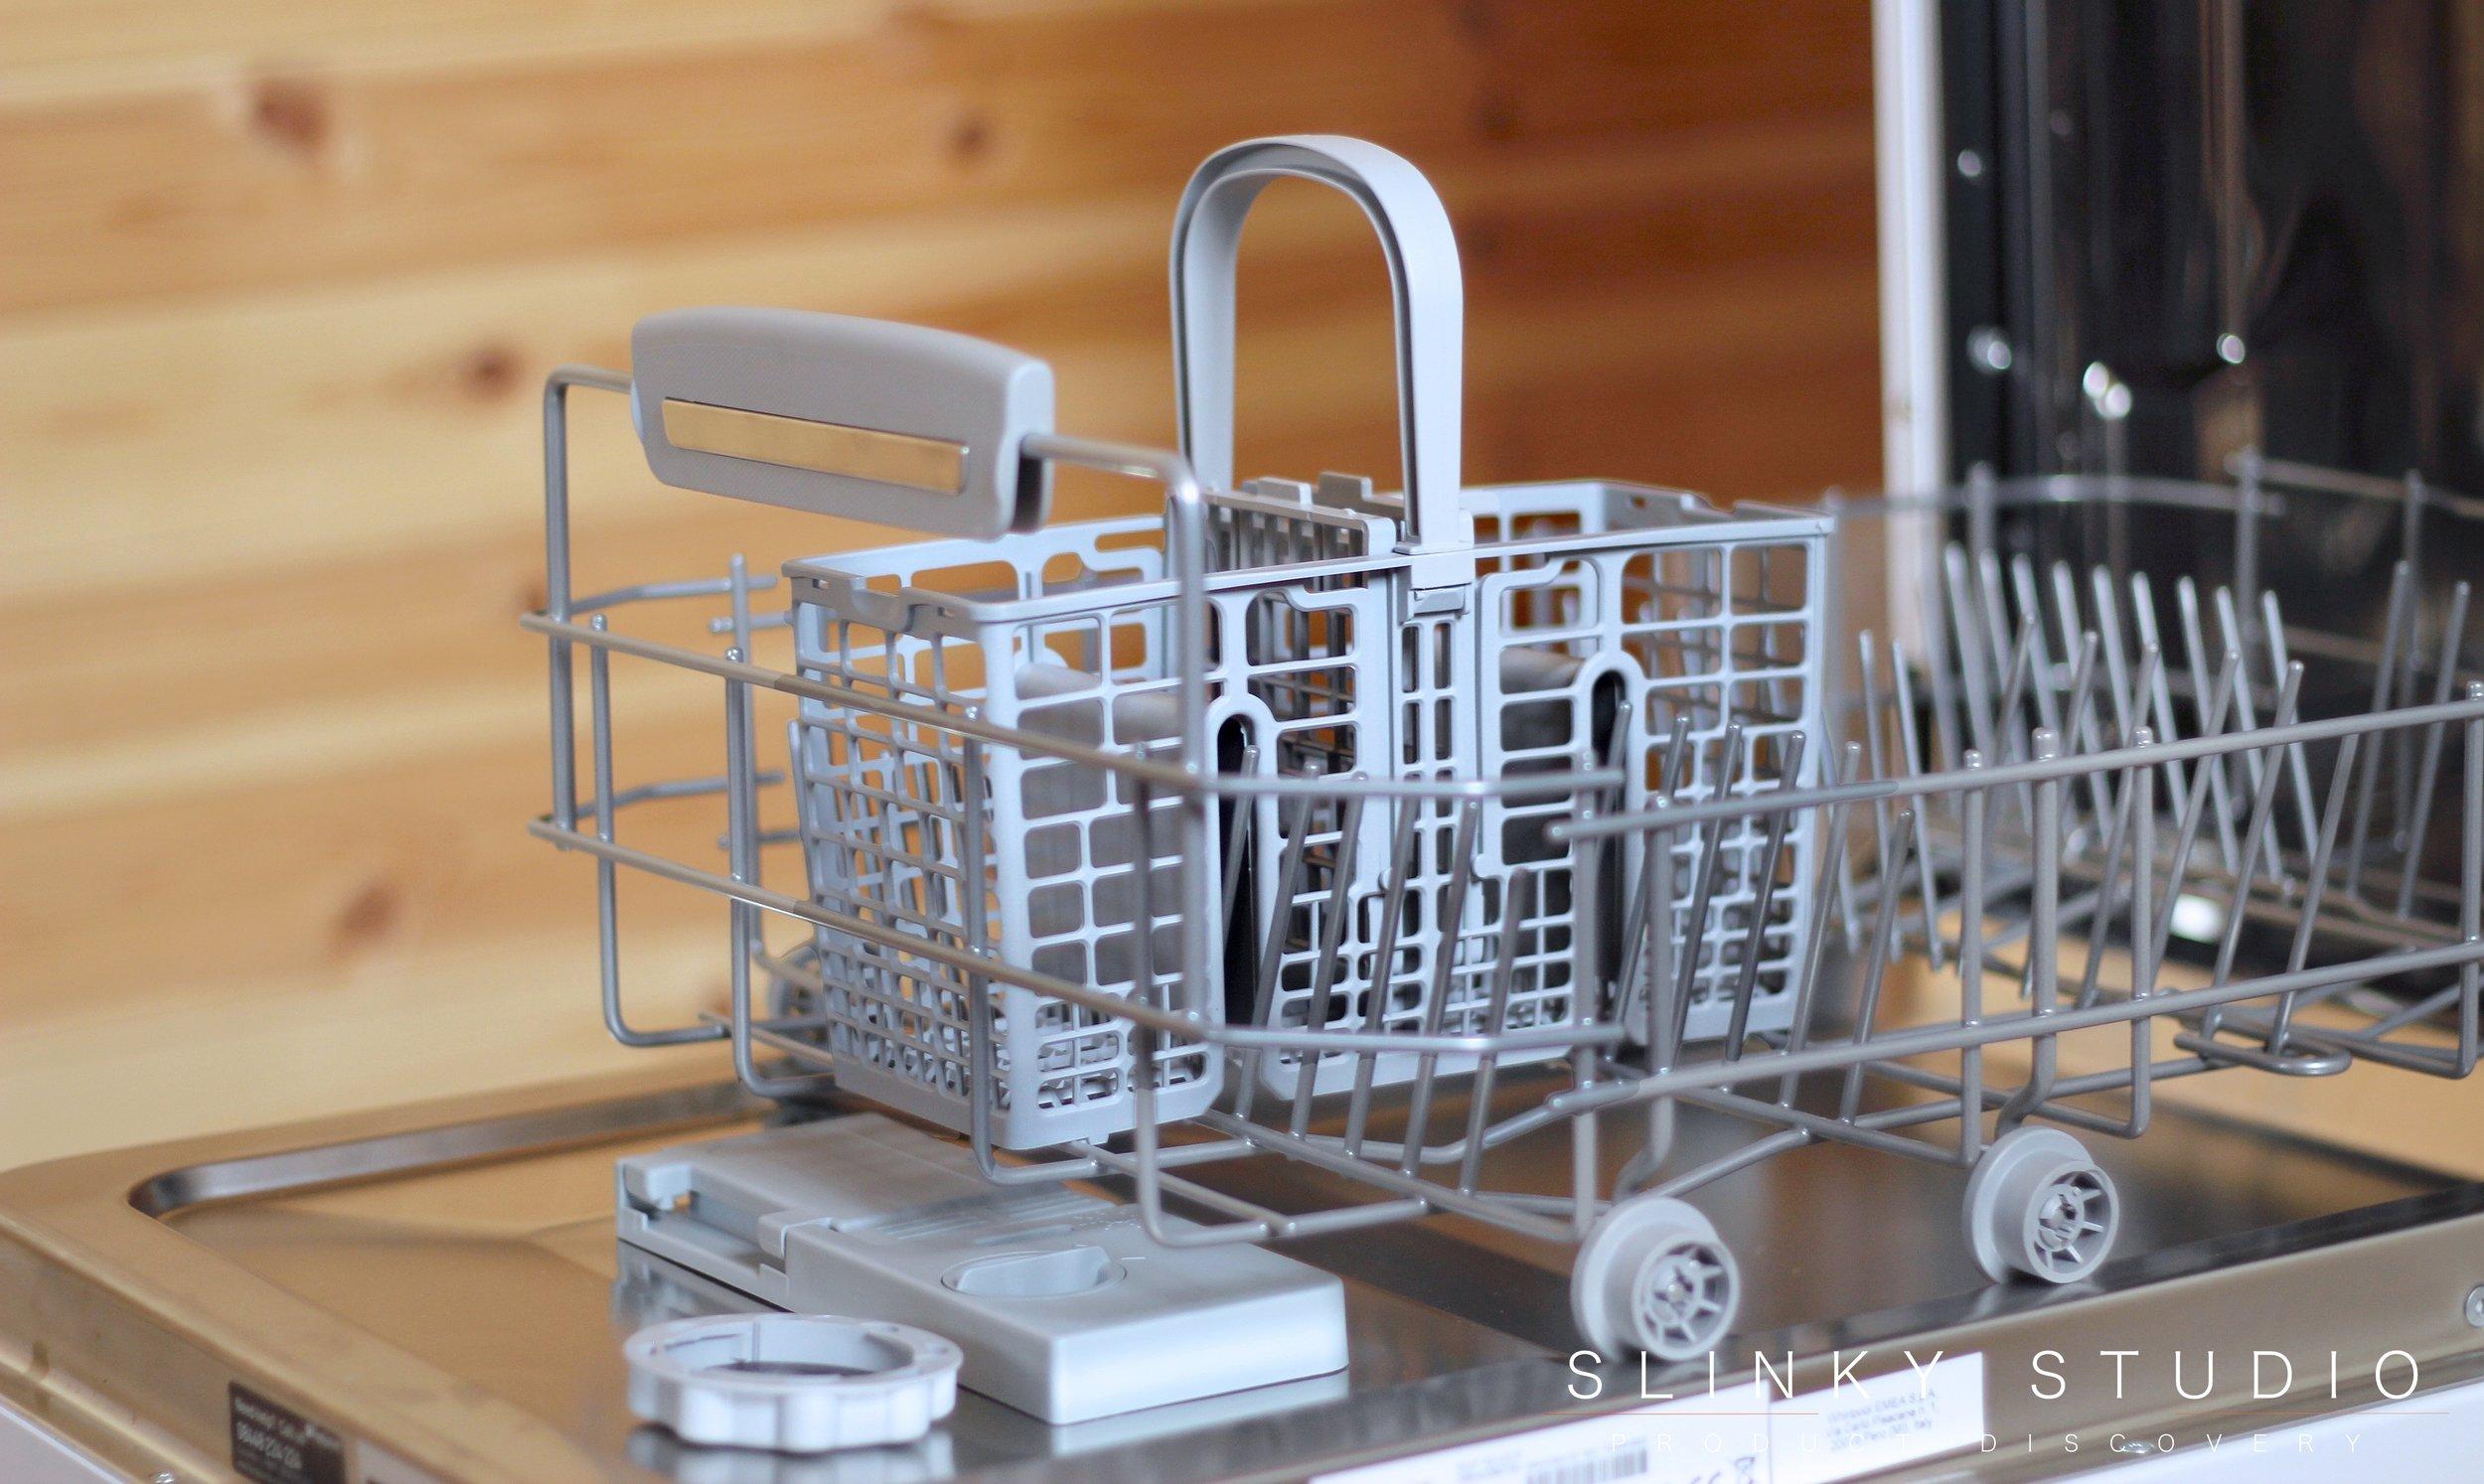 Hotpoint Ultima Slimline Dishwasher Bottom Basket rack Drawer Cutlery.jpg